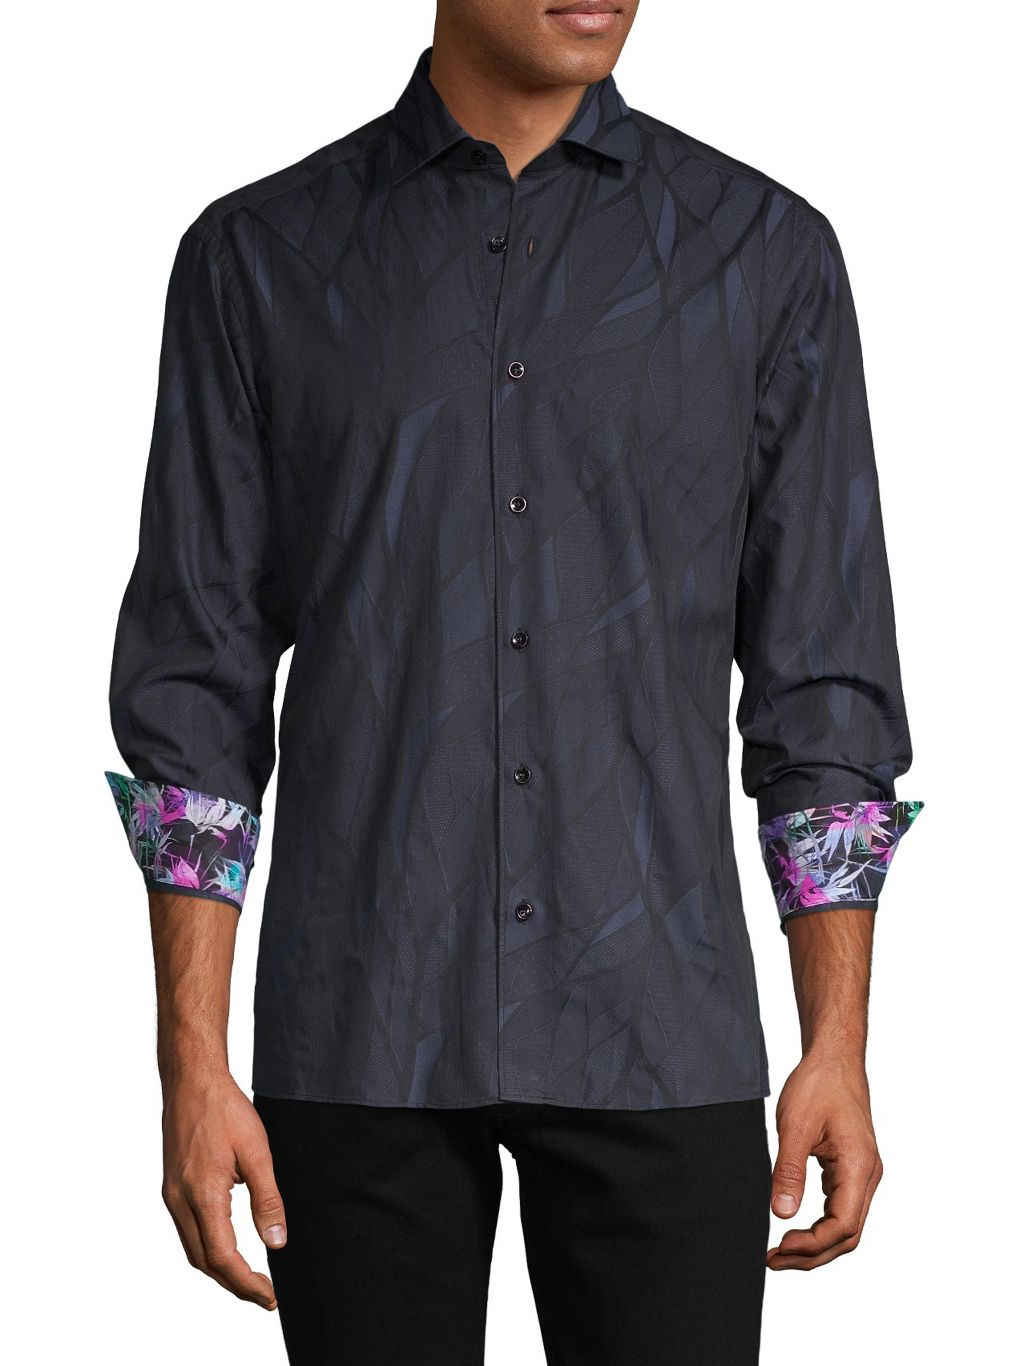 Bertigo Tonal-Print Shirt